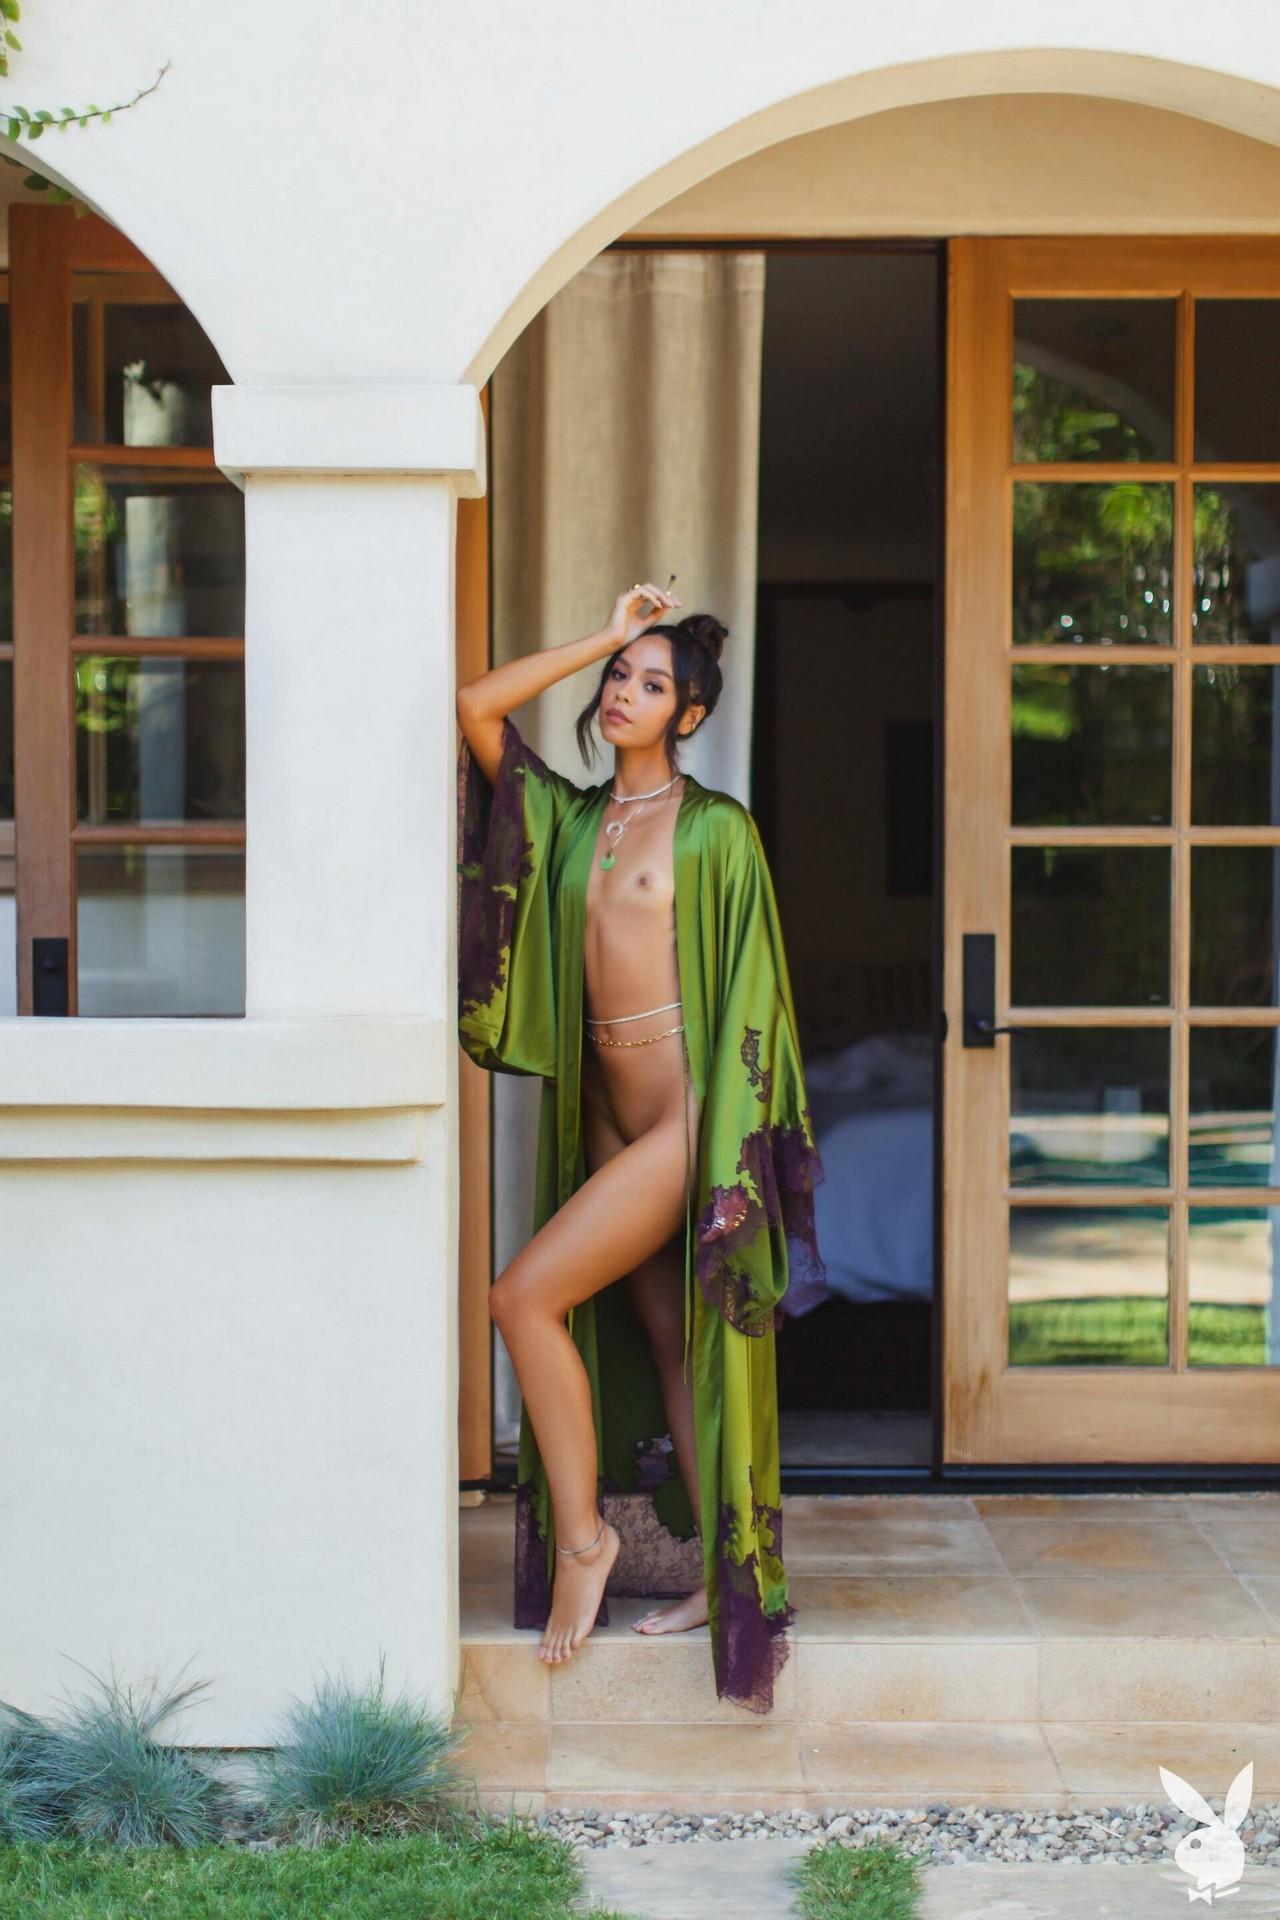 Danielle Alcaraz Playmate Outtakes Playboy Plus (13)